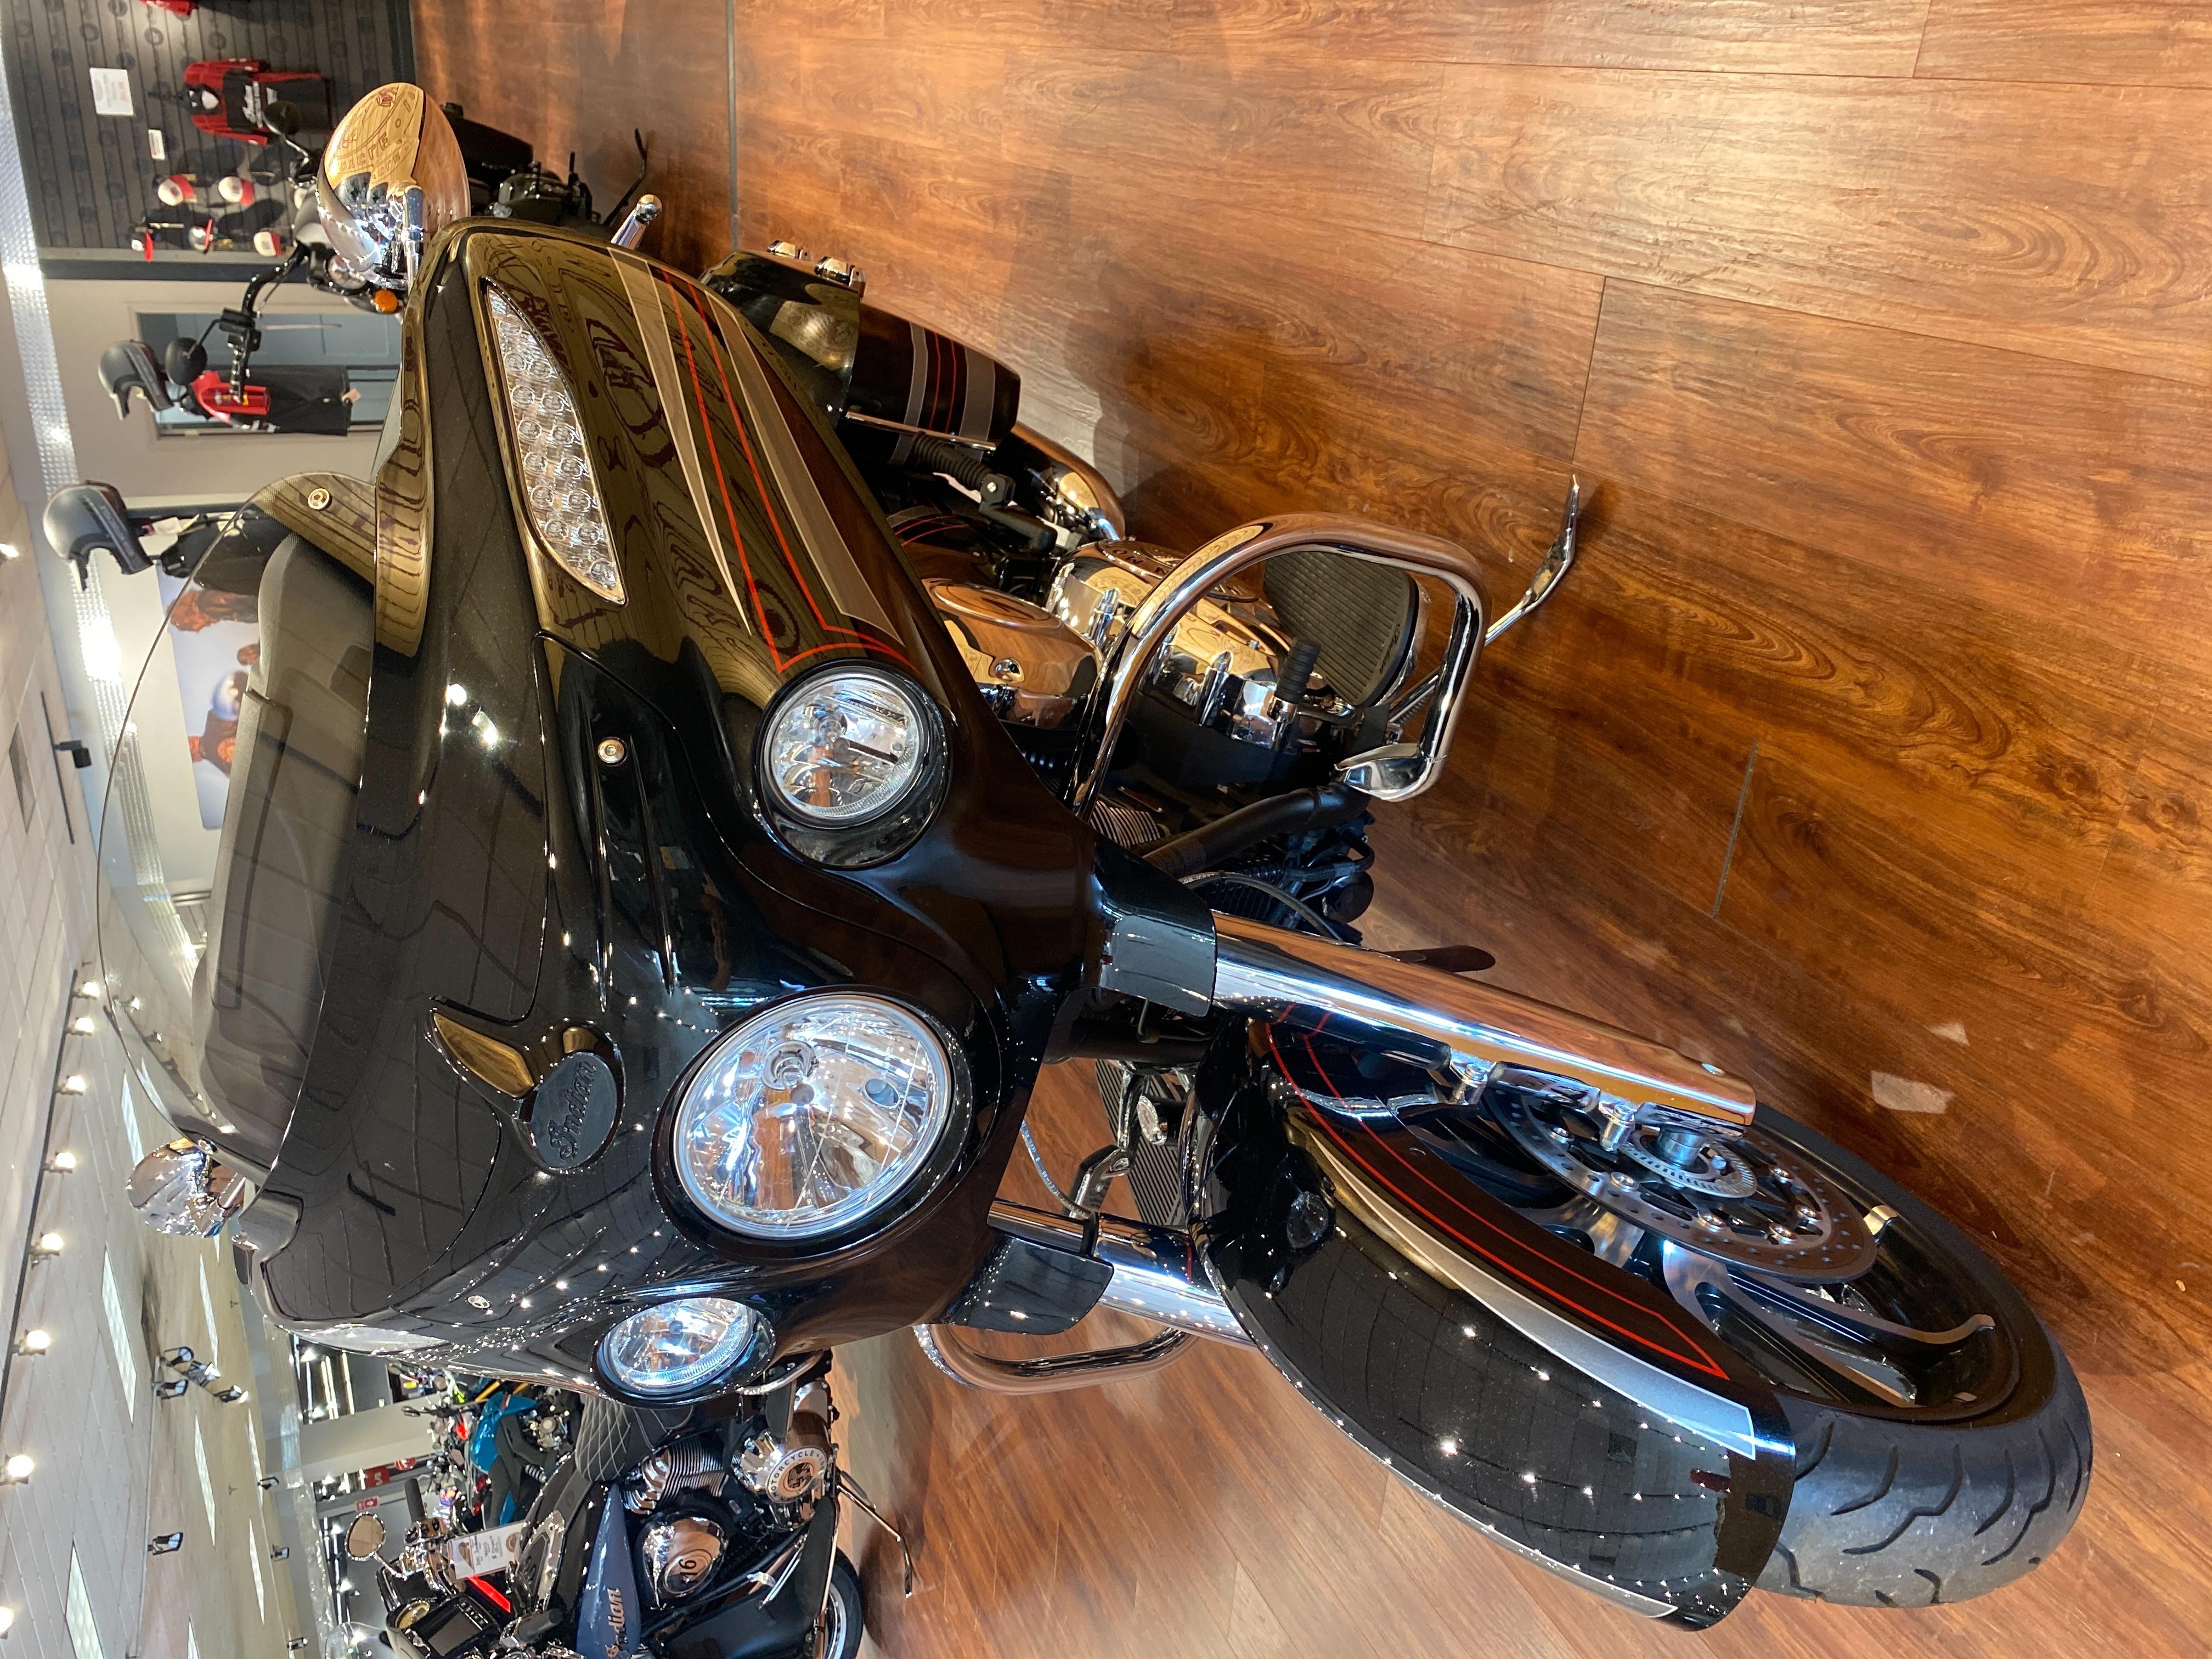 2018 Indian Chieftain Limited at Sloans Motorcycle ATV, Murfreesboro, TN, 37129